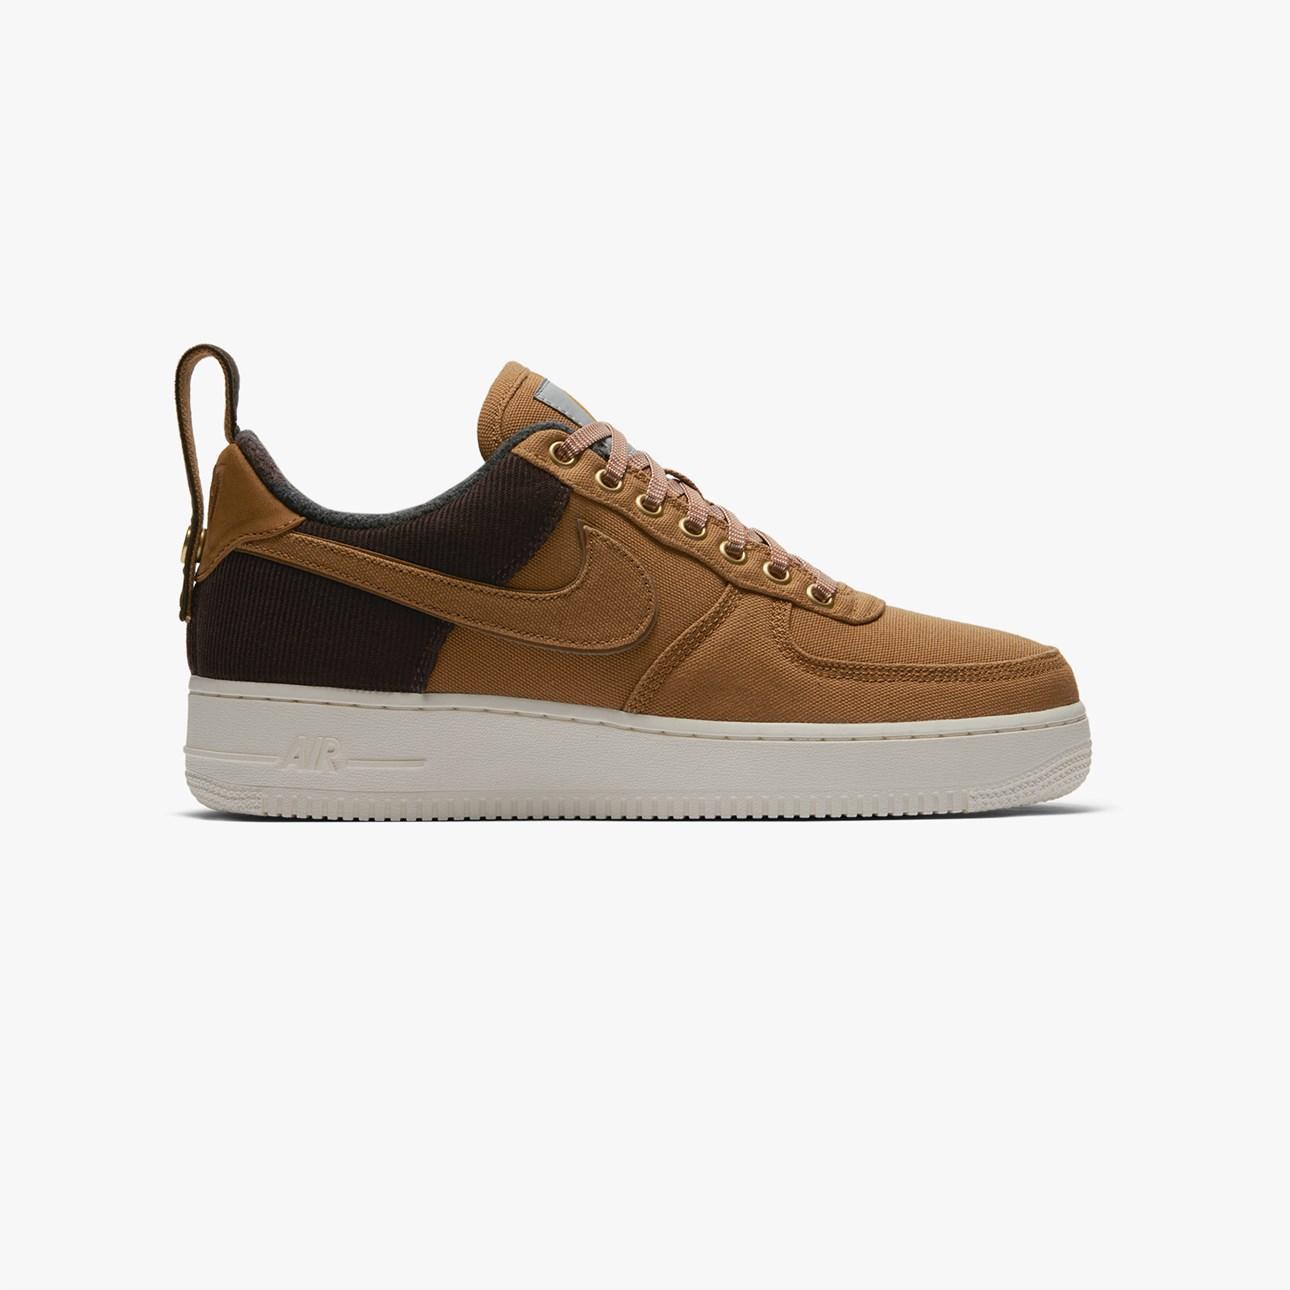 Nike Sportswear Air Force 1 07 Premium x Carhartt WIP